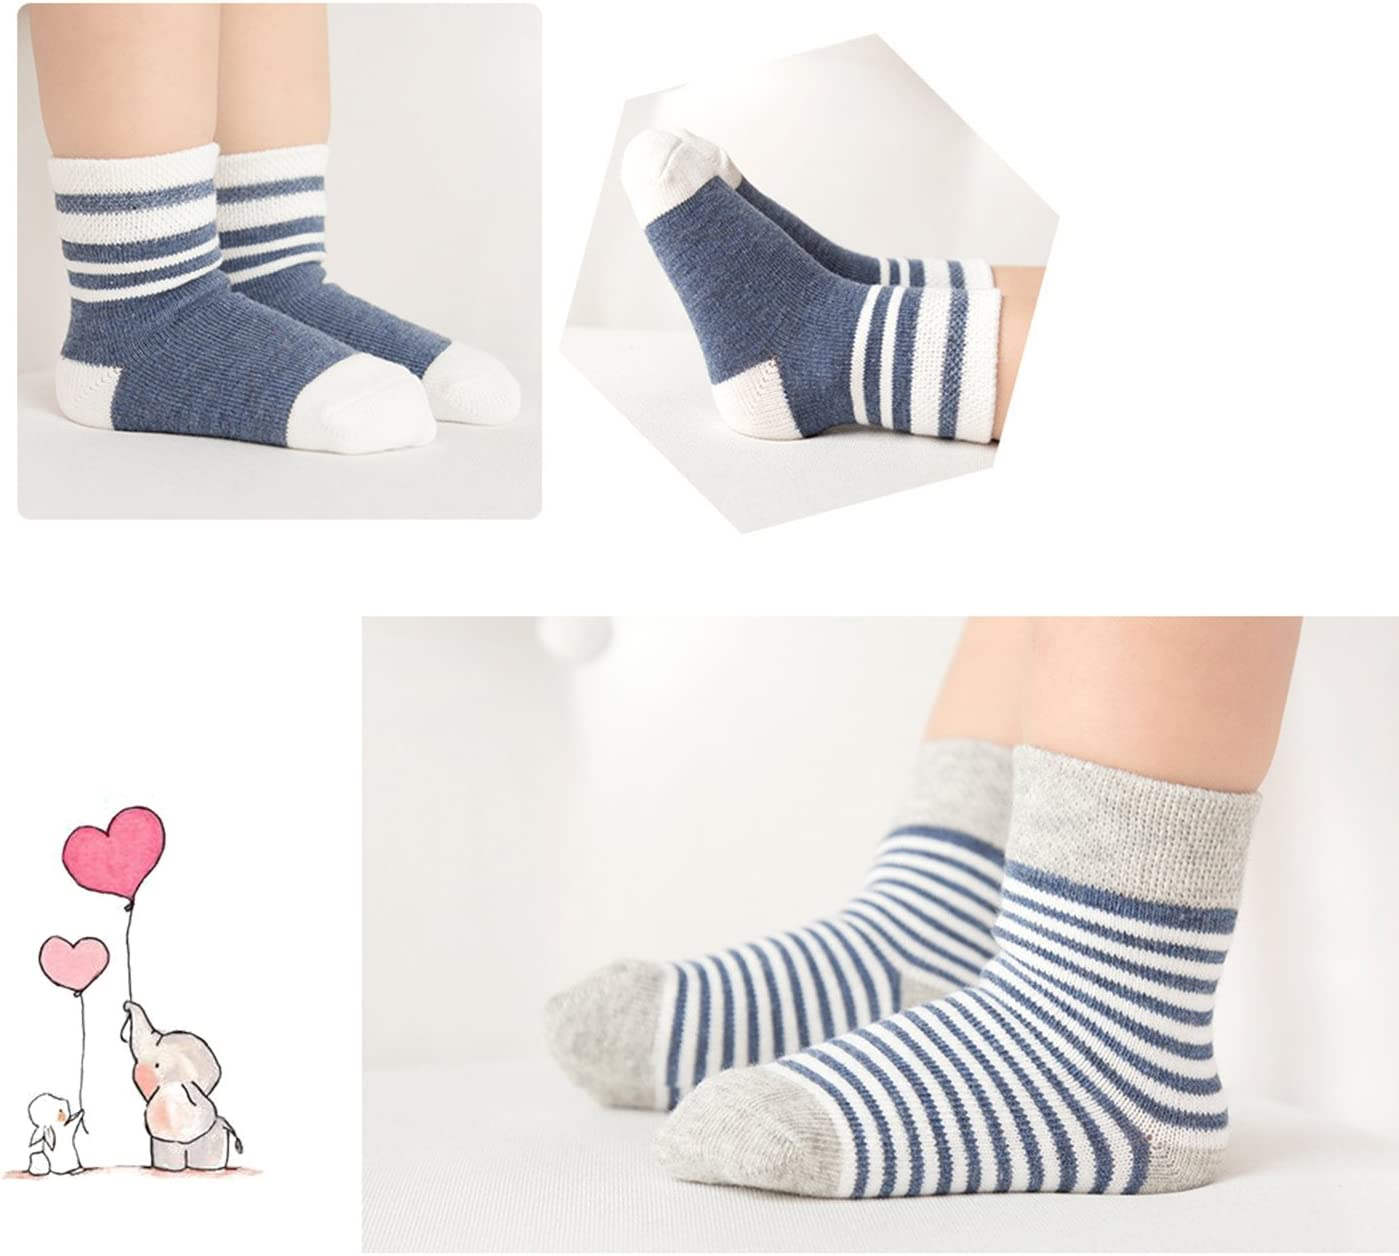 Caudblor Infant Toddler Ankle Crew Stripe Socks with Multi Size Blue Baby Boys Girls Cotton Socks L